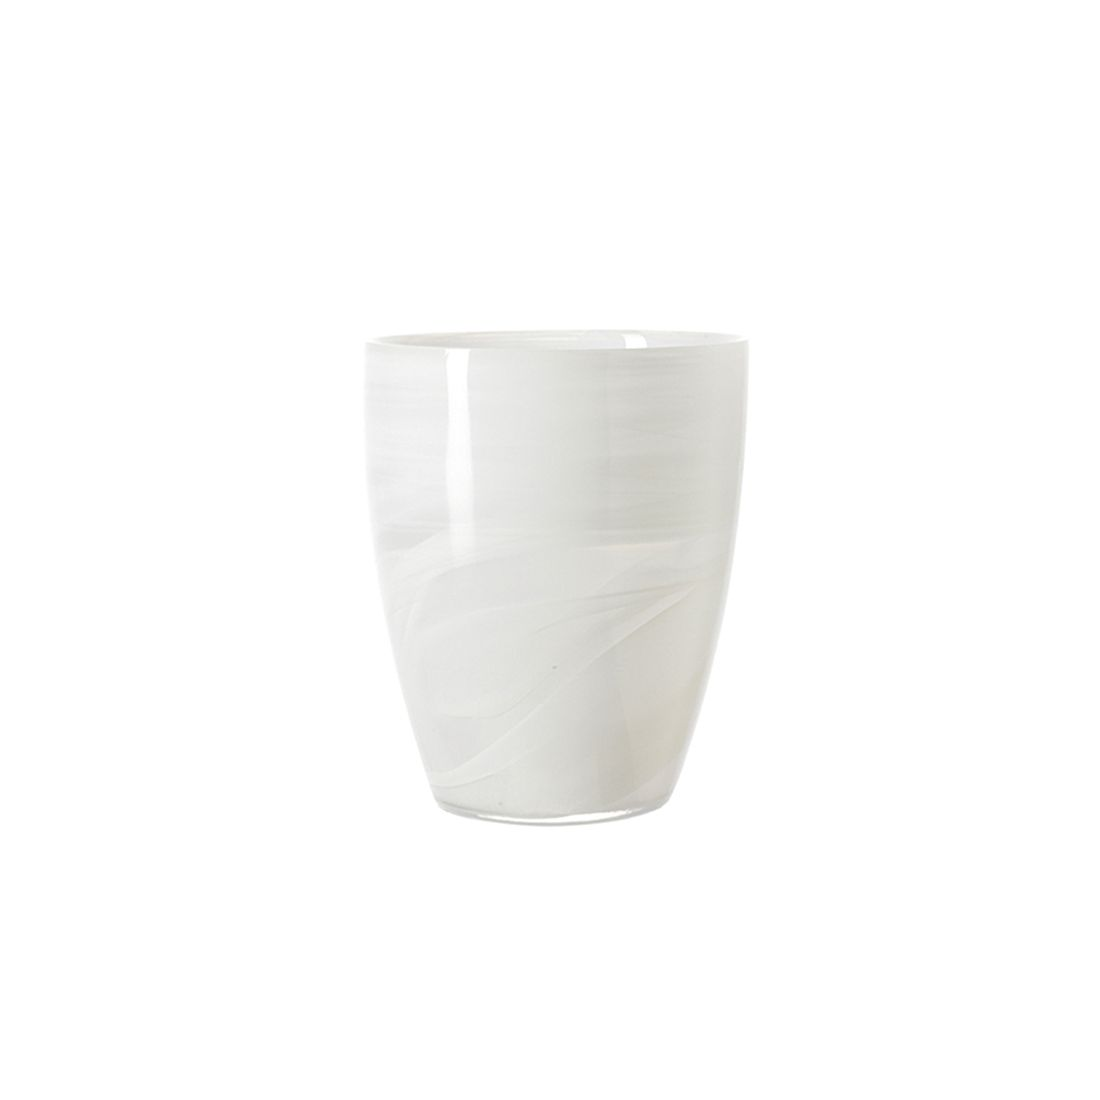 Vase/Windlicht Alabastro - 19 cm, Leonardo